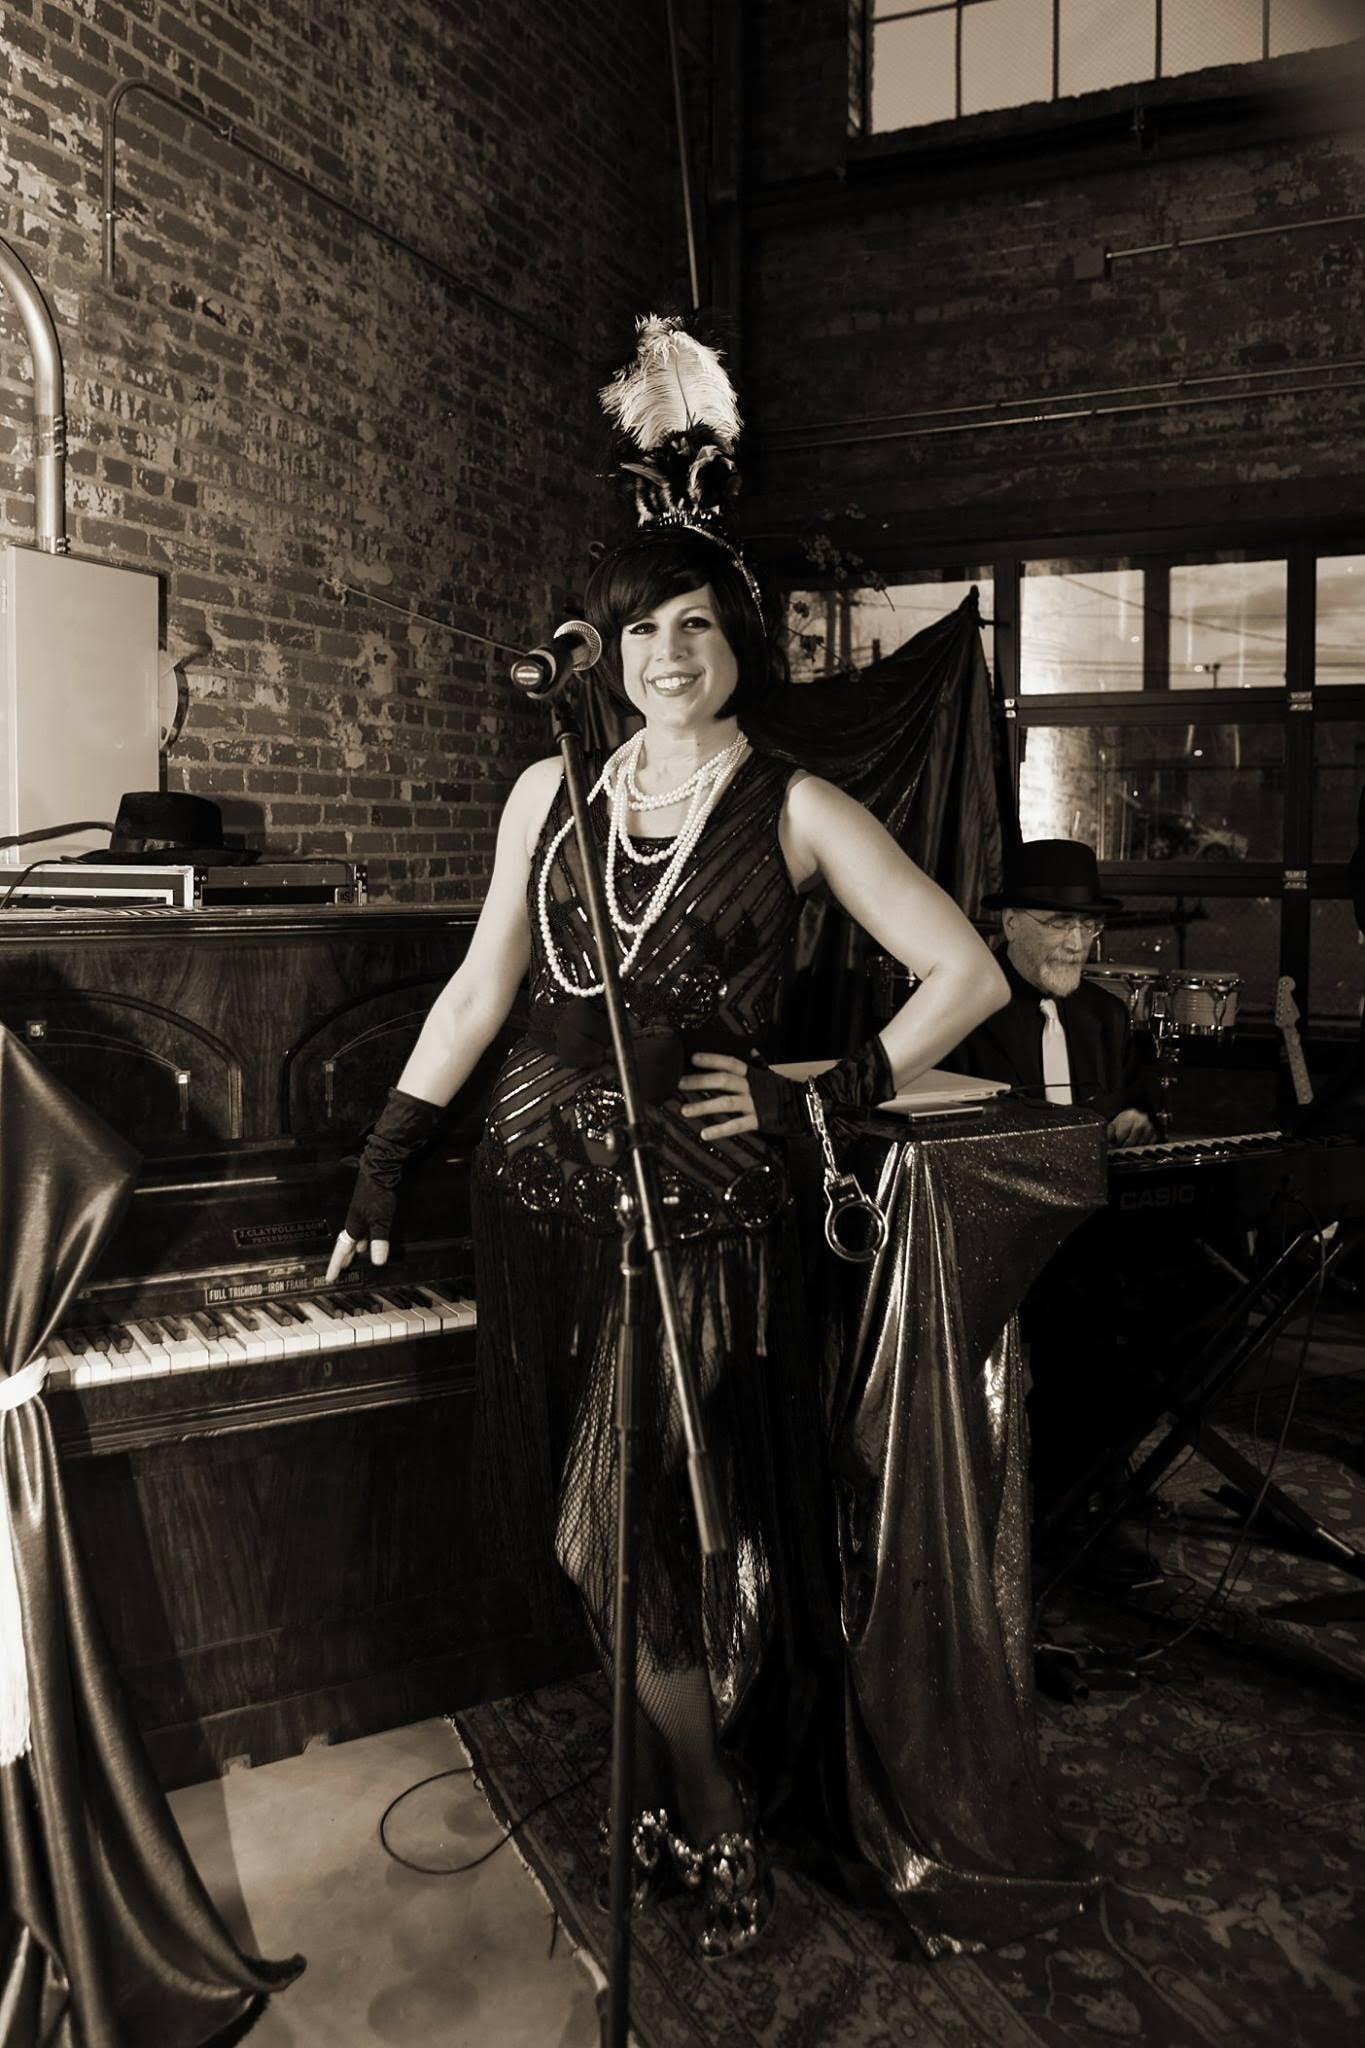 Sunday Jazz Picnic 10/7: The Dave Fox & Jessi